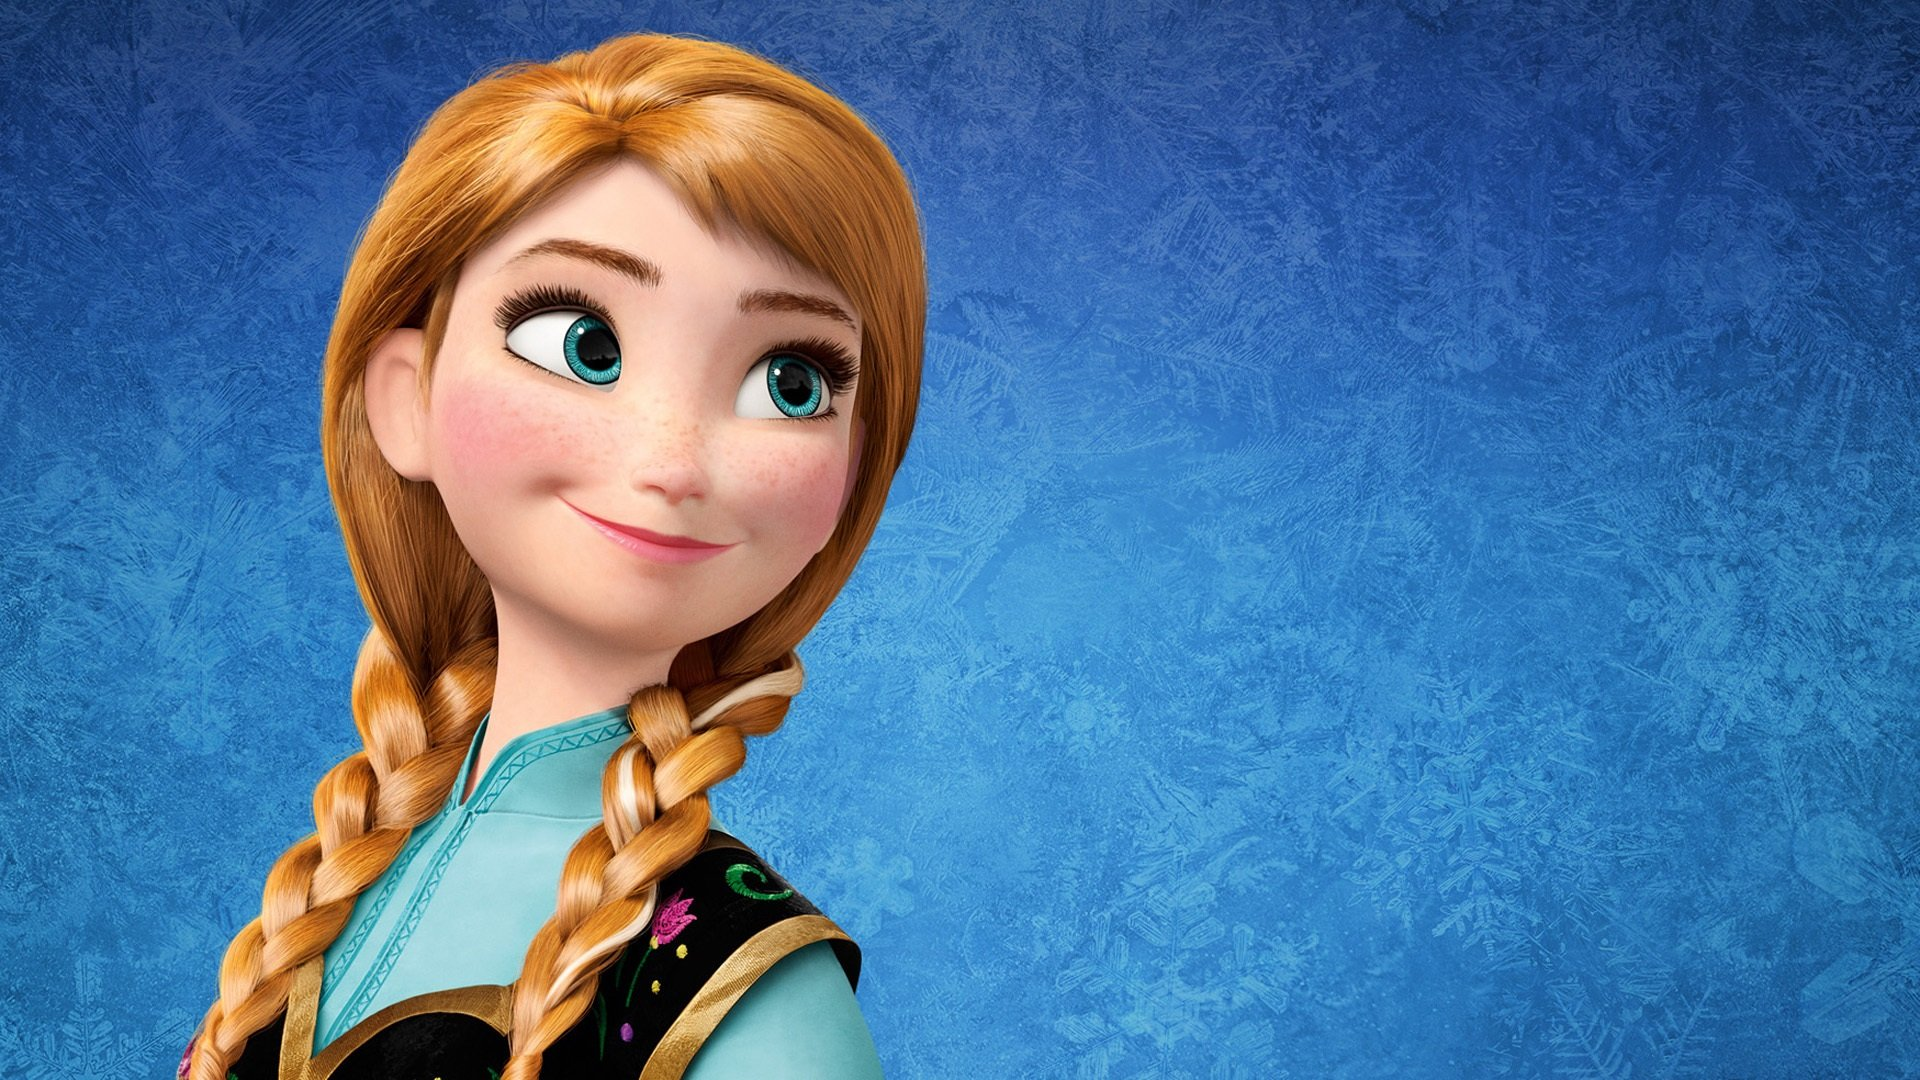 anna wallpaper,hair,cartoon,doll,hairstyle,animated cartoon